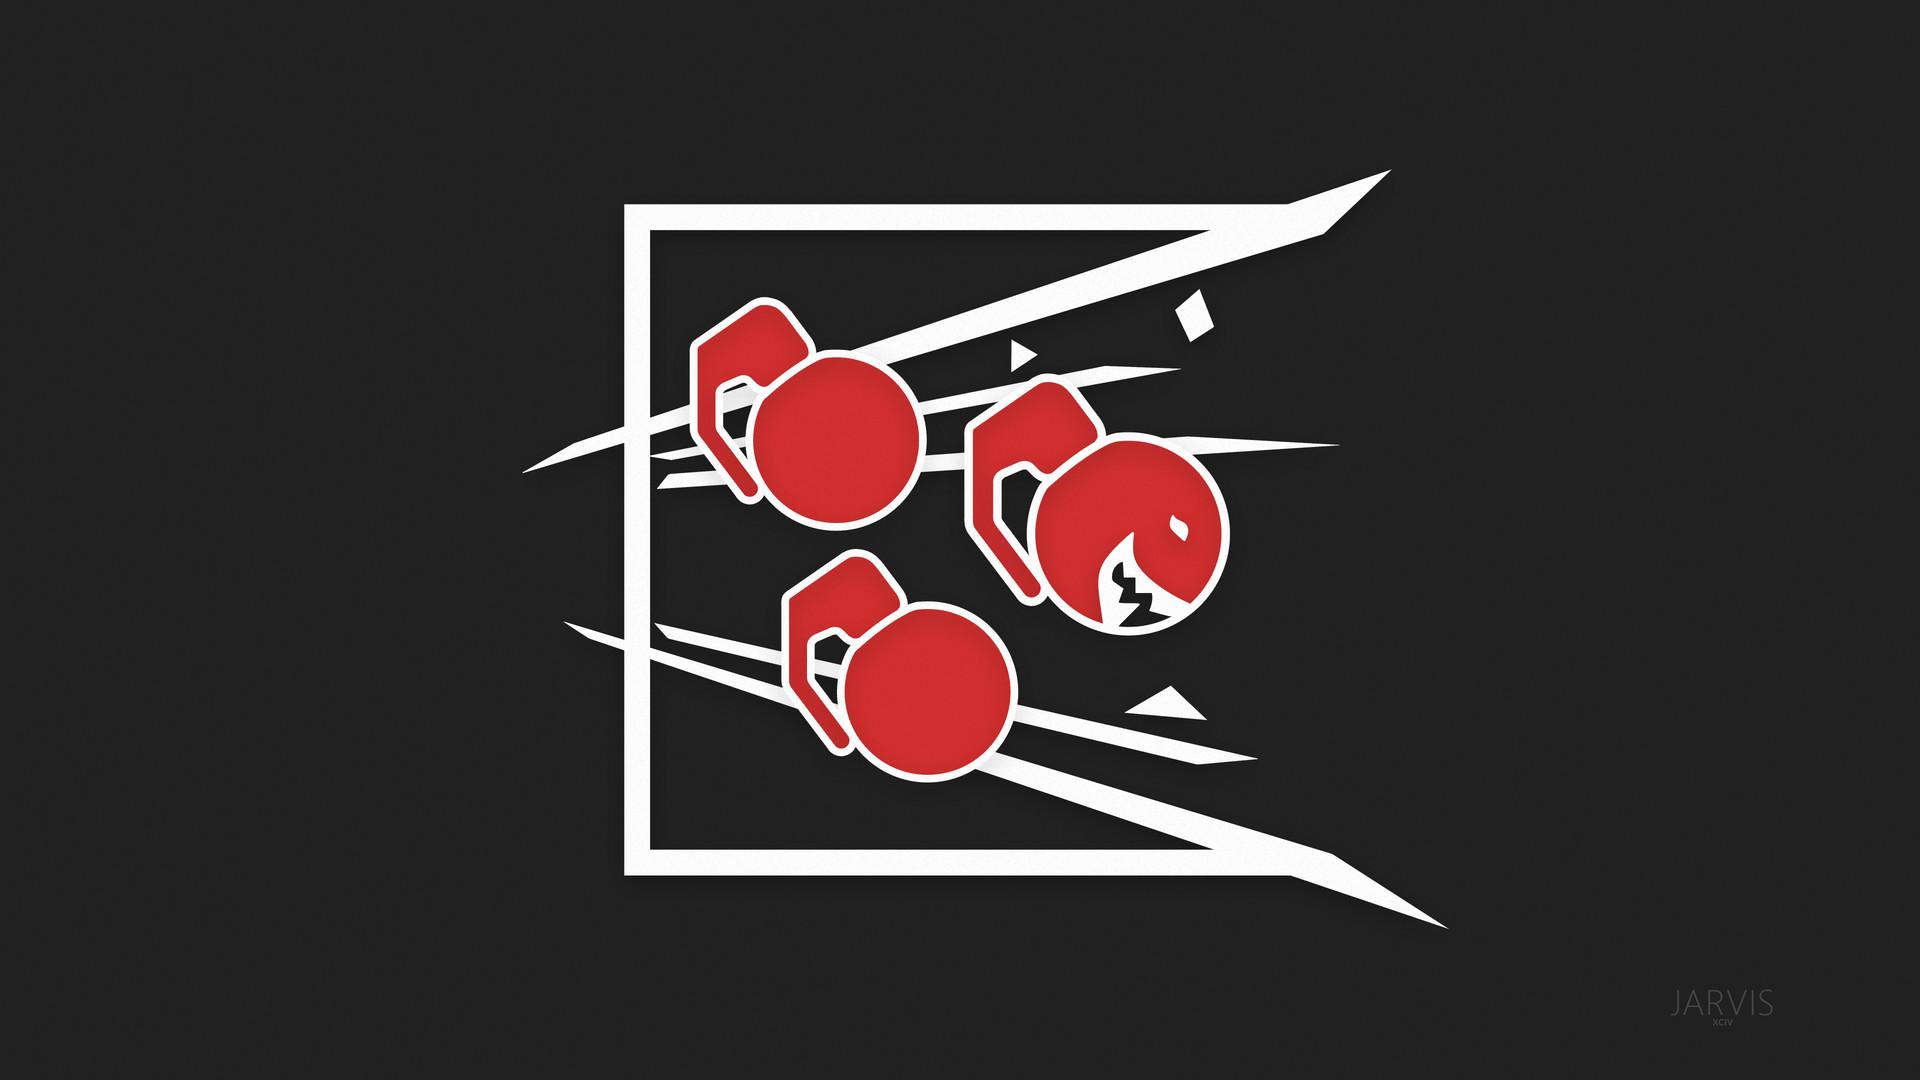 Artstation Fuze Icon Wallpaper Pack Jarvis Xciv